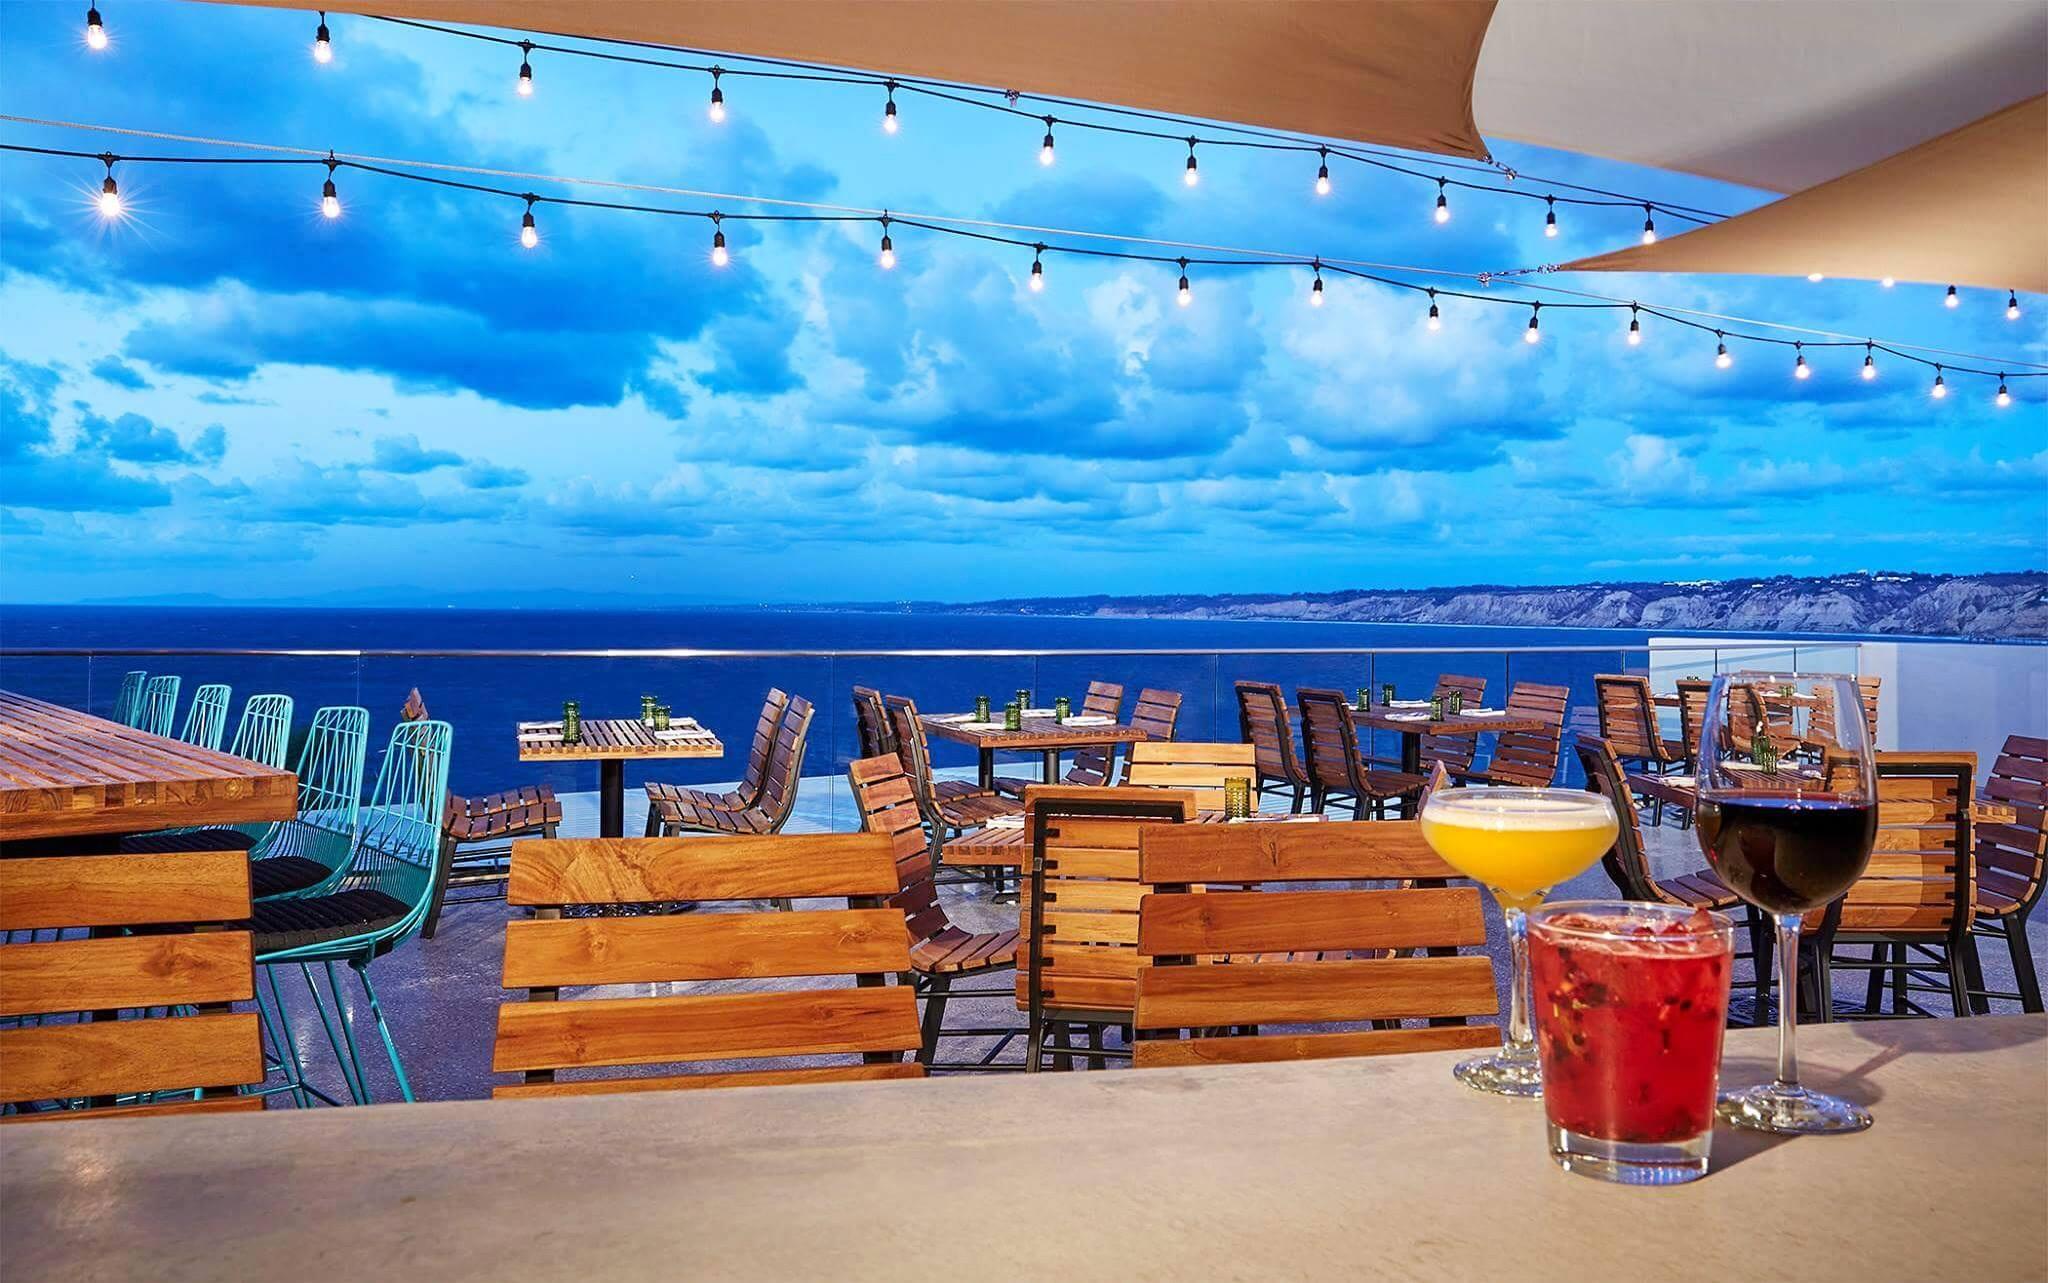 Best Downtown La Restaurants With A View